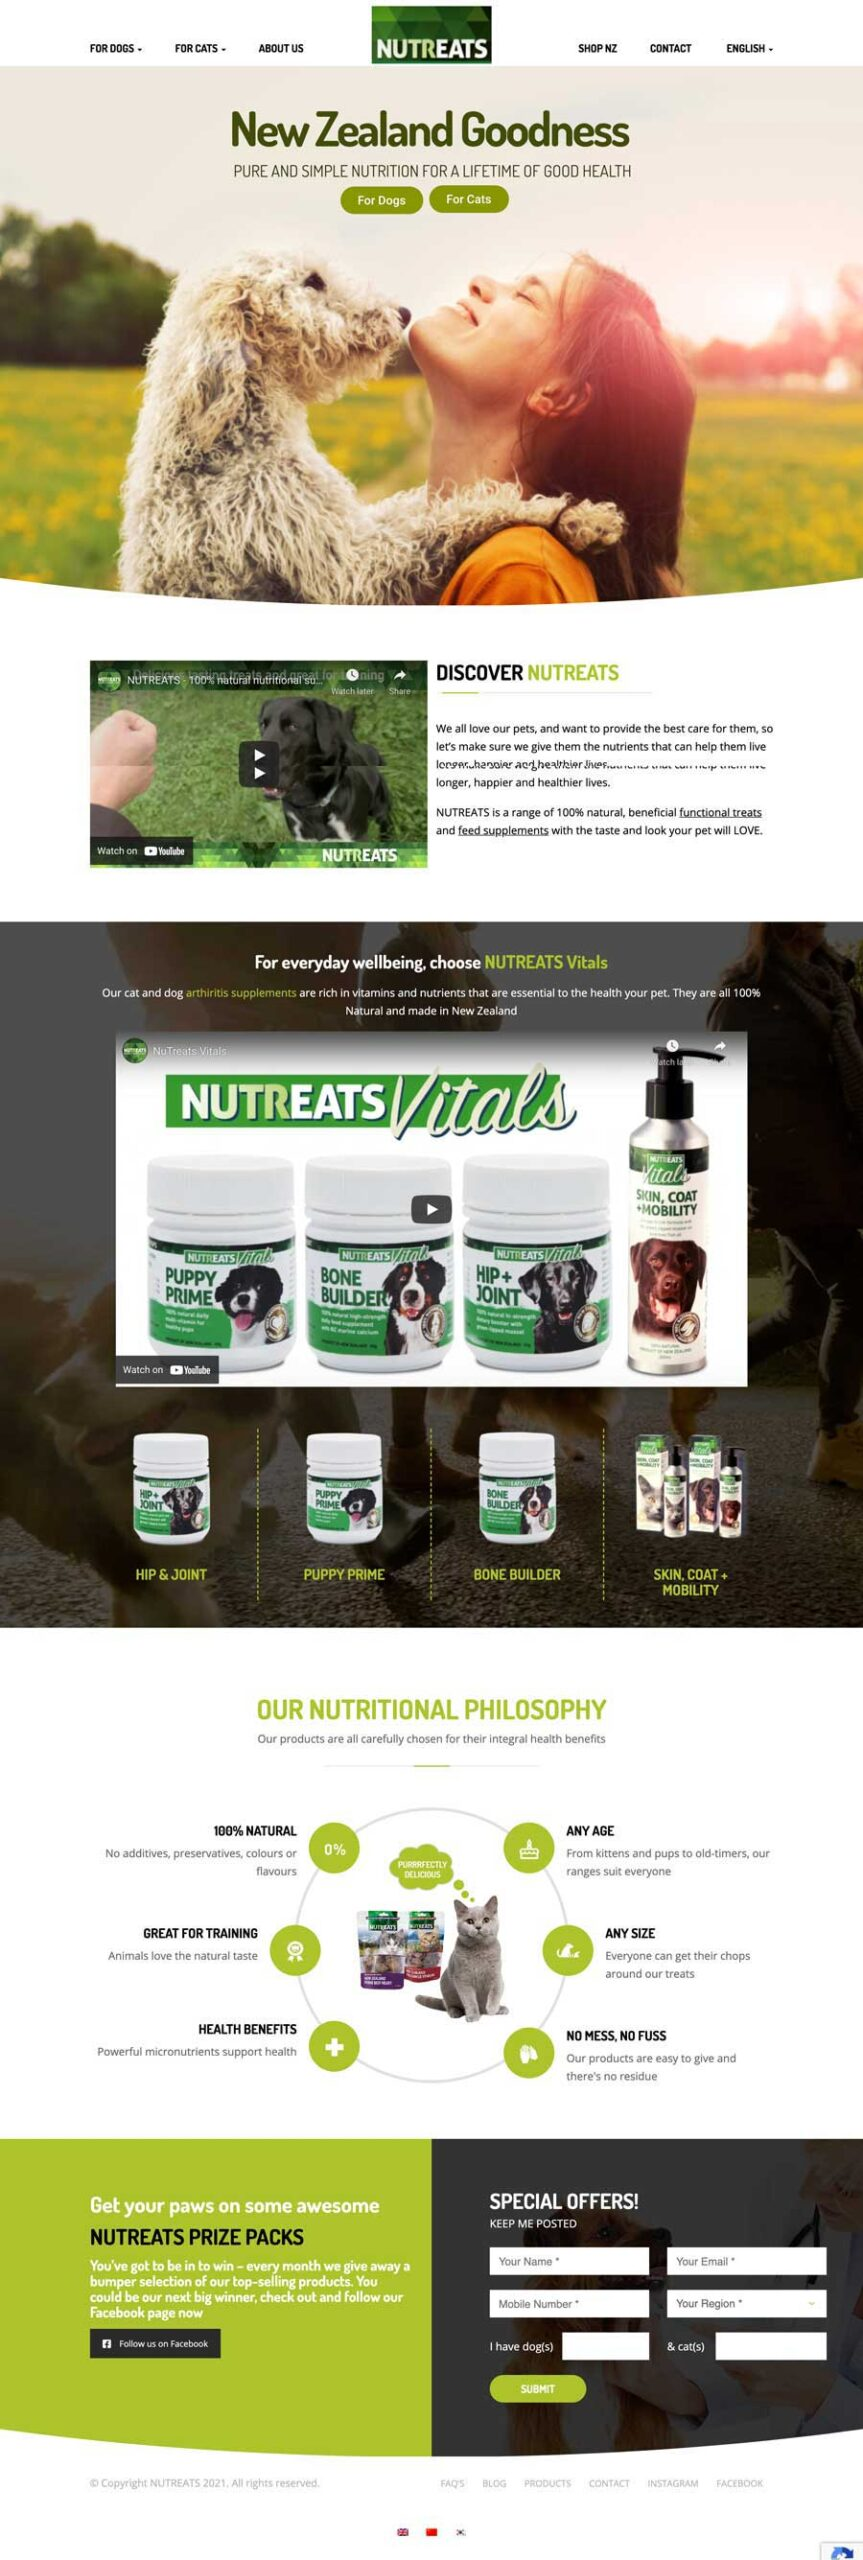 Nutreats Design Online shop ecommerce and SEO